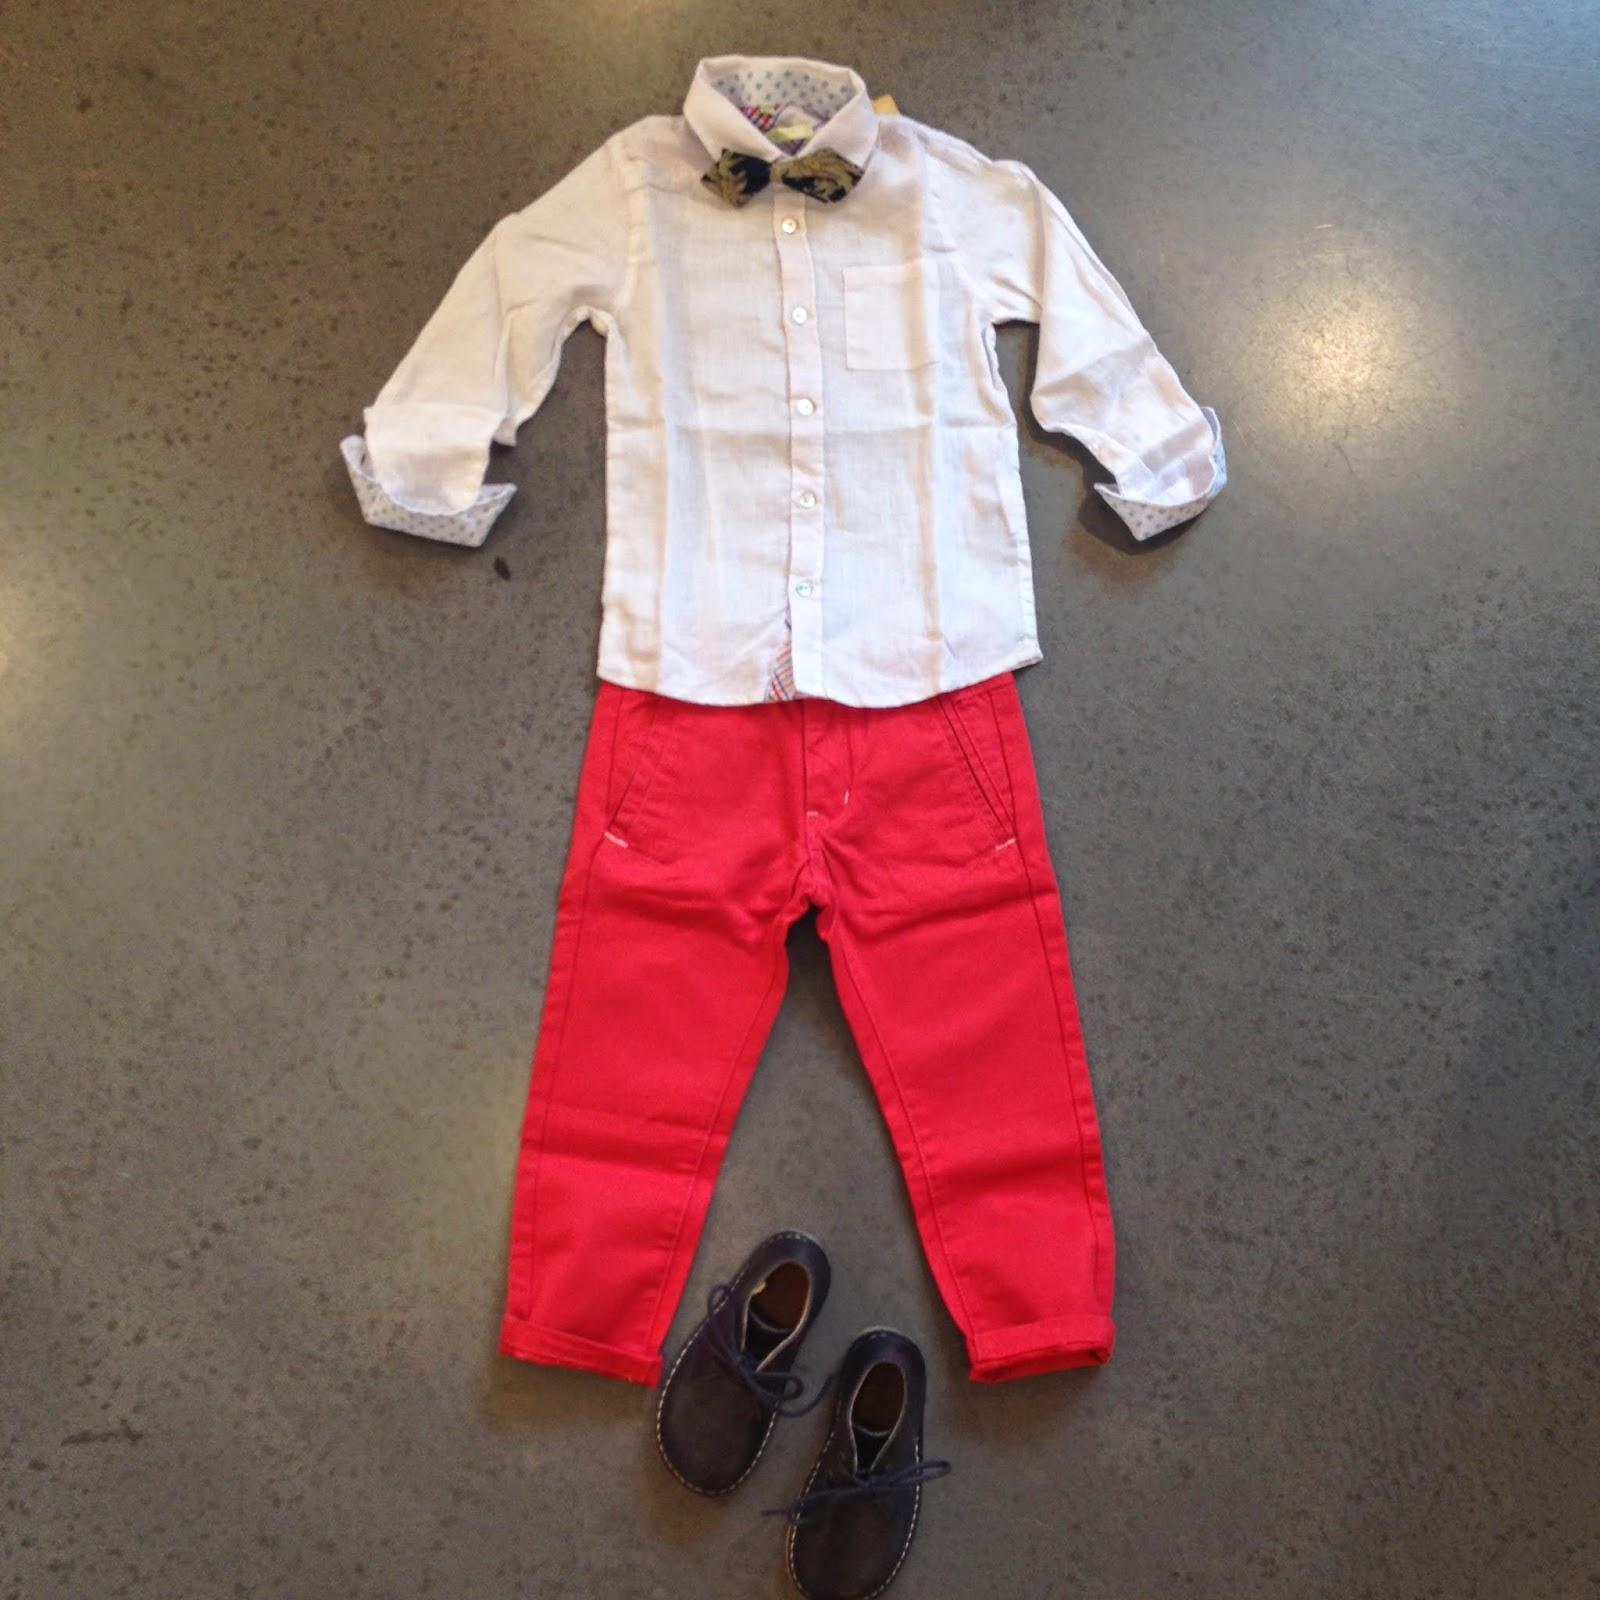 2314302a Rød bukse fra Molo, 3 - 10 år. Skjorte fra Aston Martin, 2 - 7 år. Sløyfe  fra Scotch Shrunk, one size. Sko fra Bisgaard